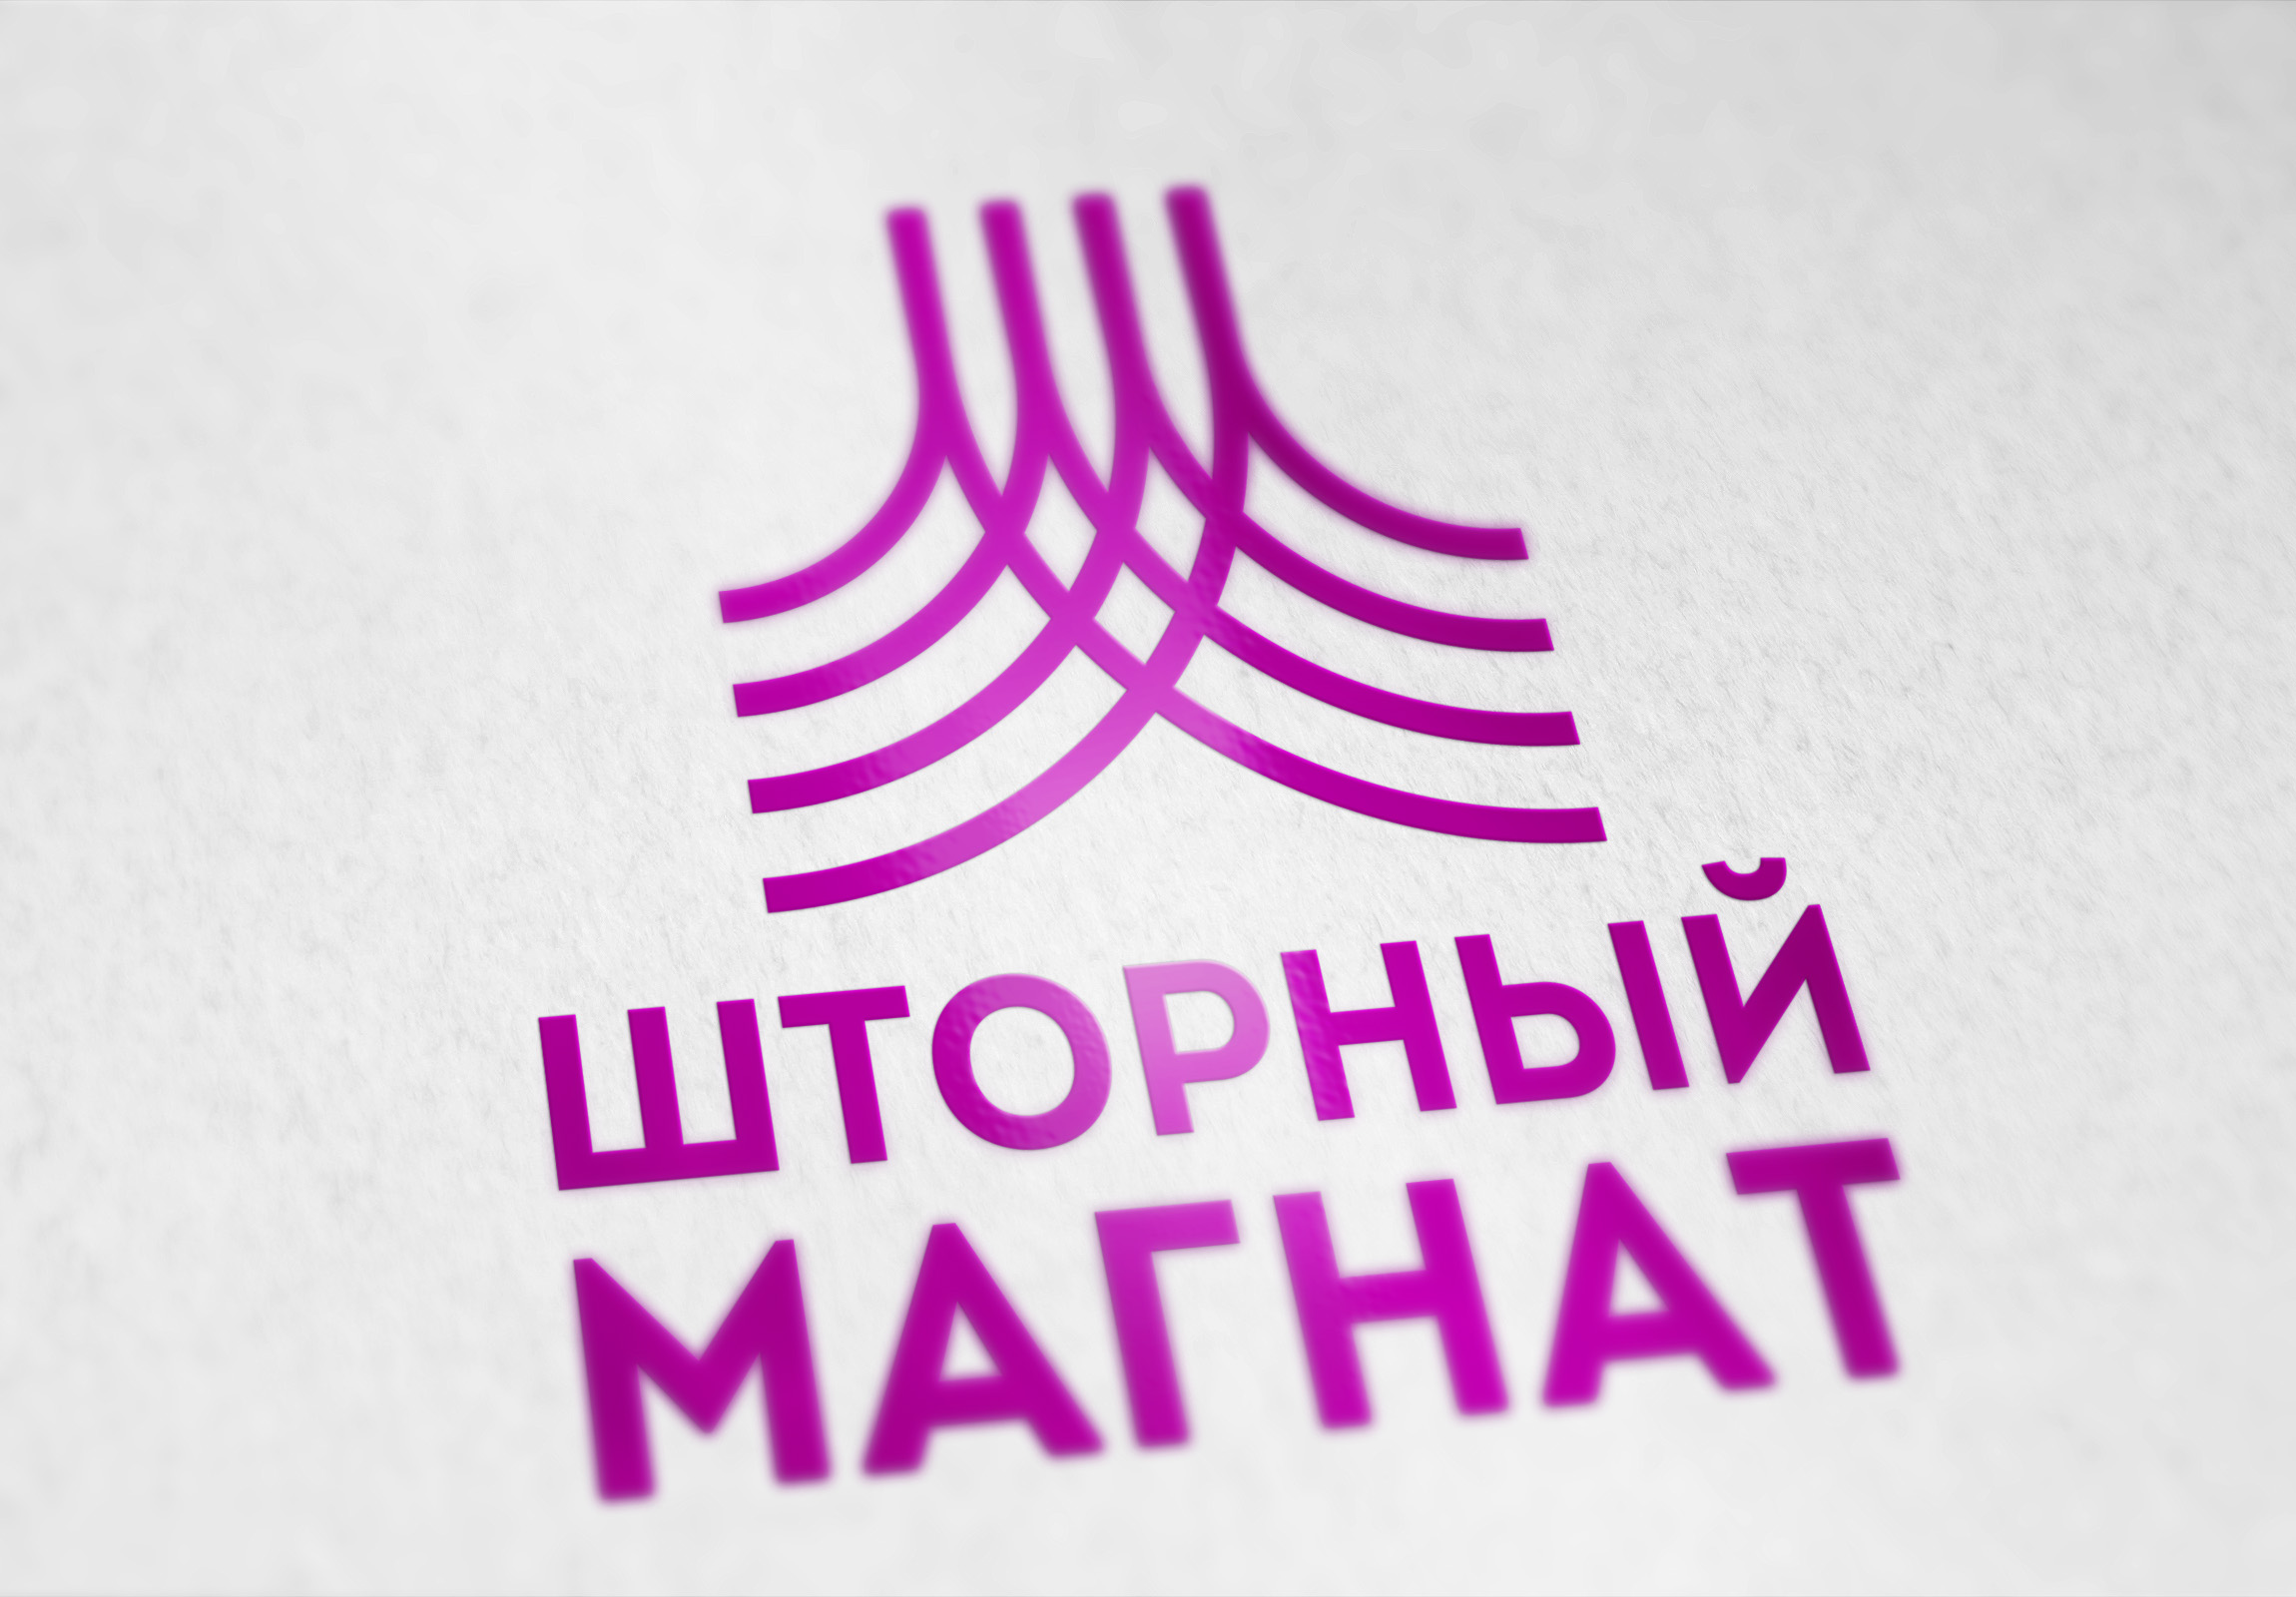 Логотип и фирменный стиль для магазина тканей. фото f_7025cd944bfee2bf.jpg